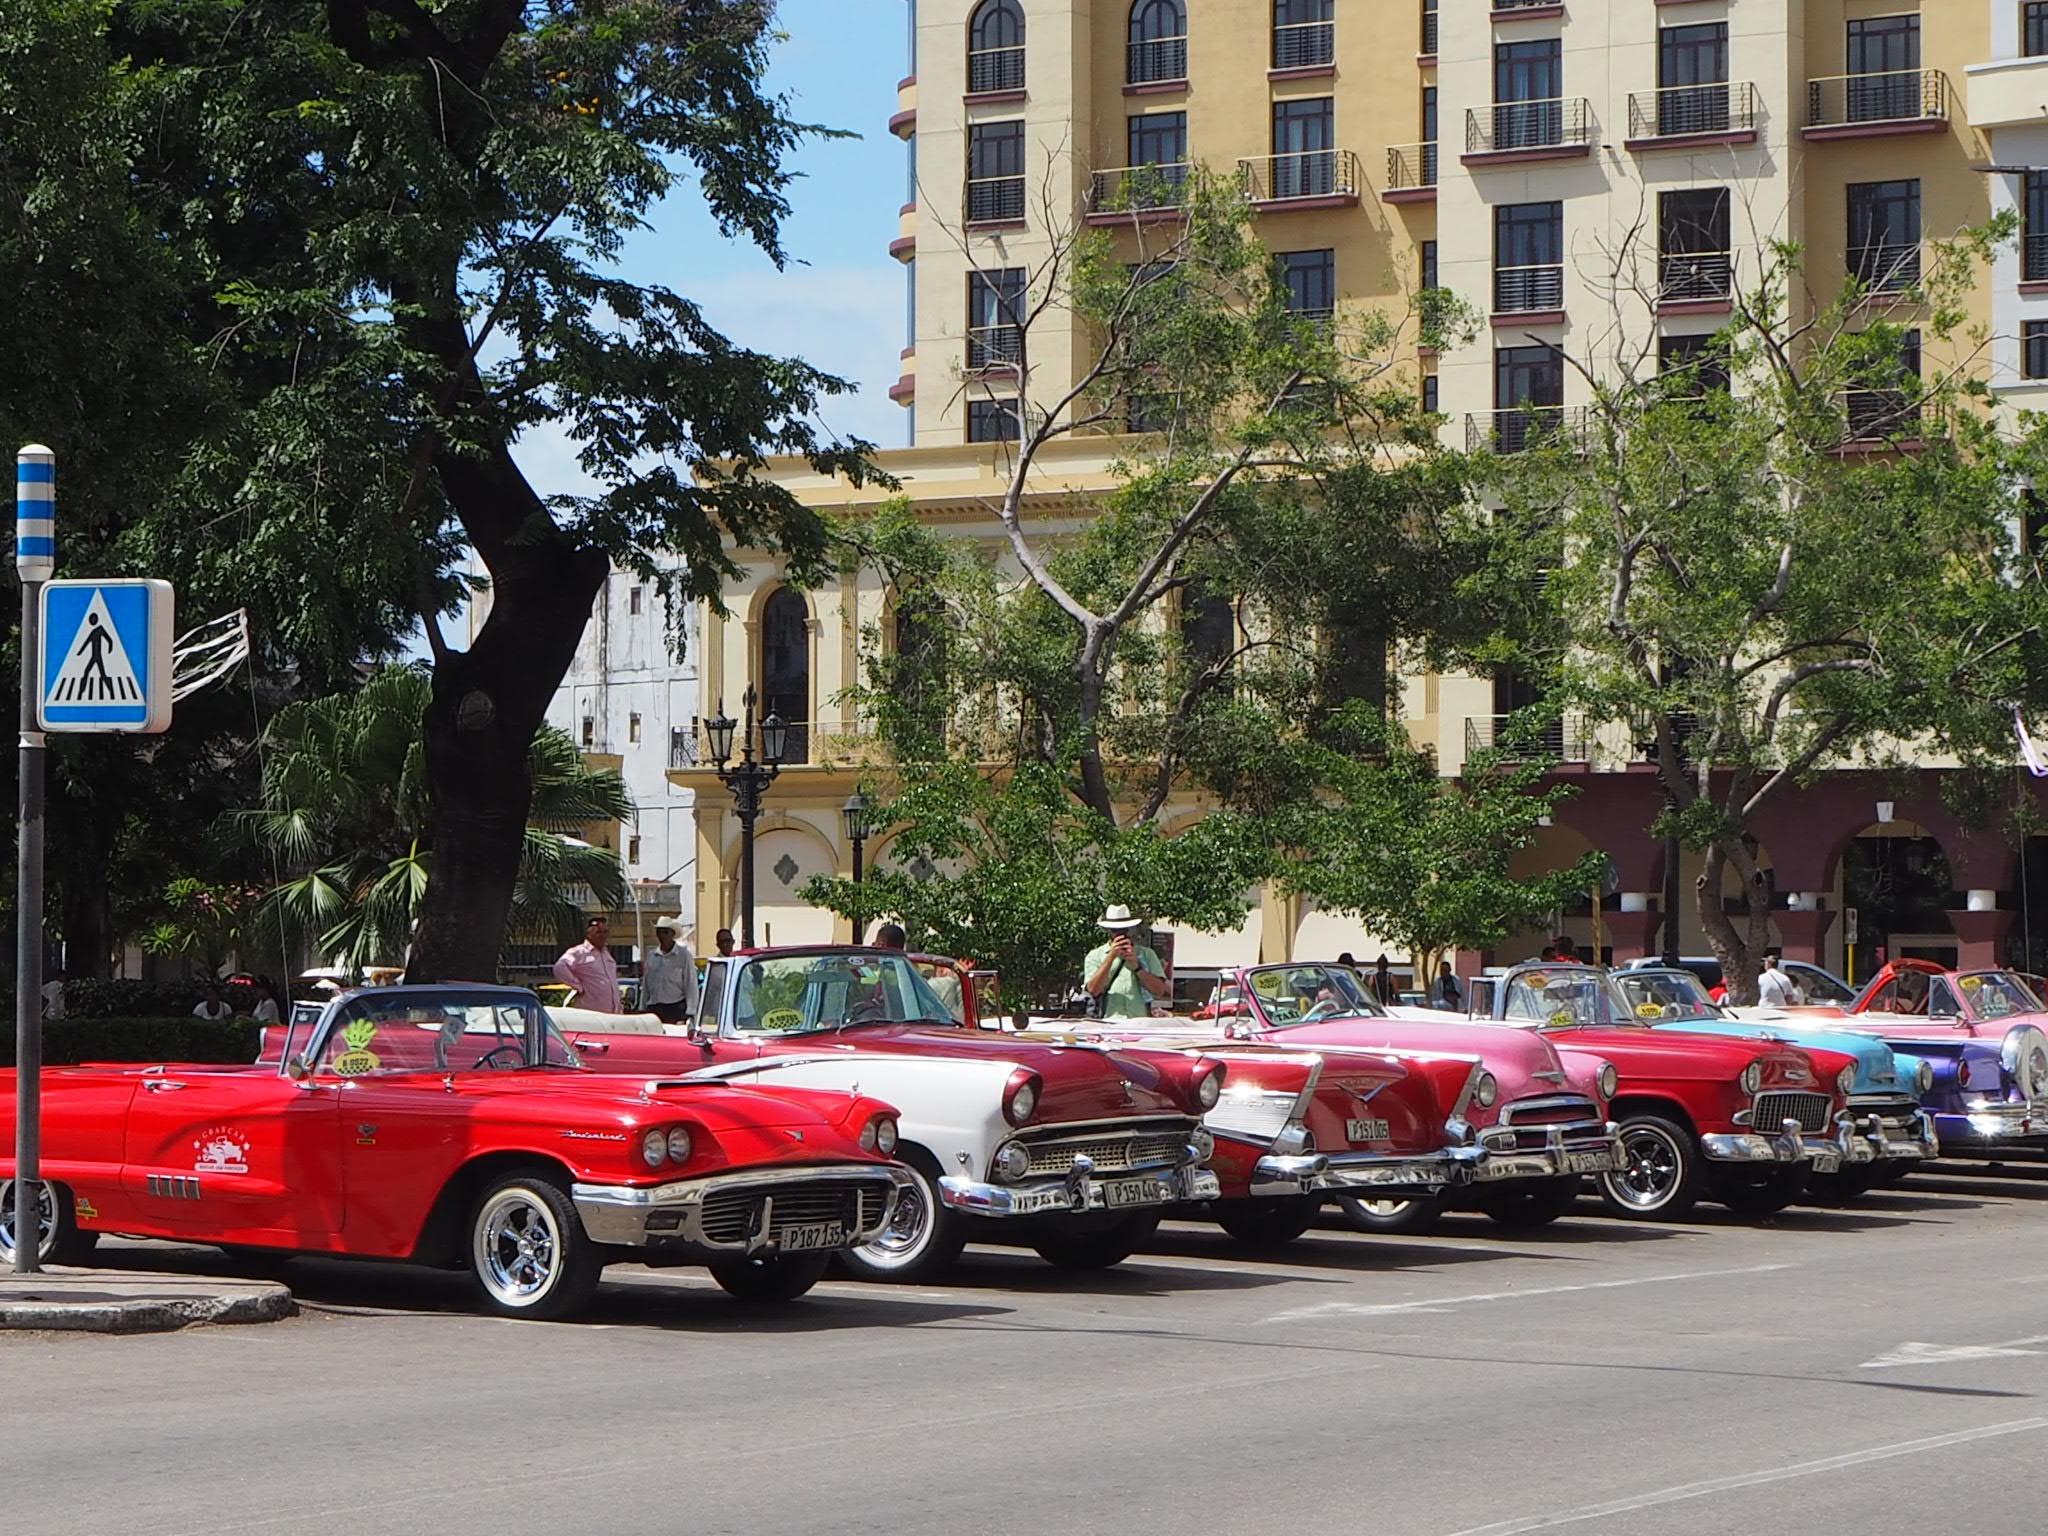 Oldtimer Cuba Cultuur